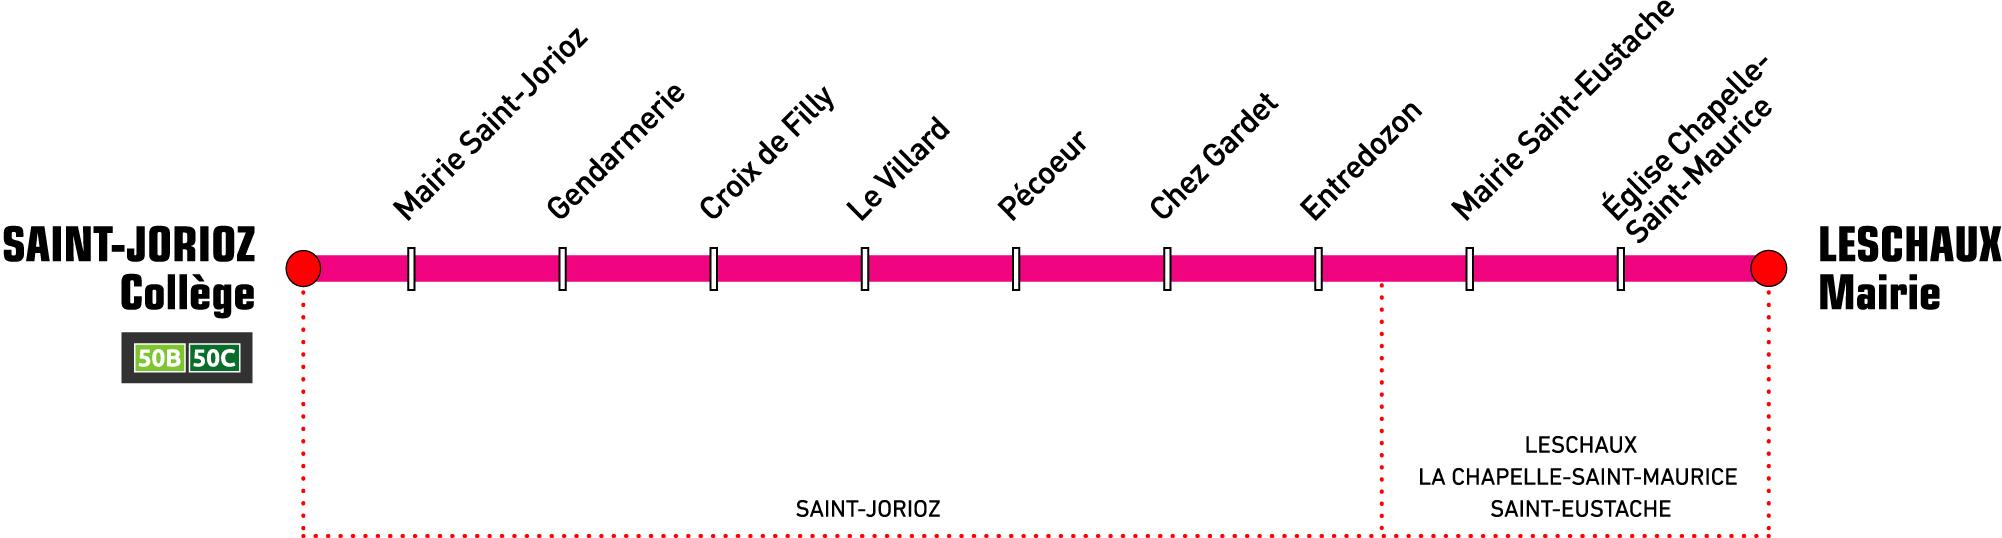 Thermomètre Ligne Proxibus 2 - Août 2021